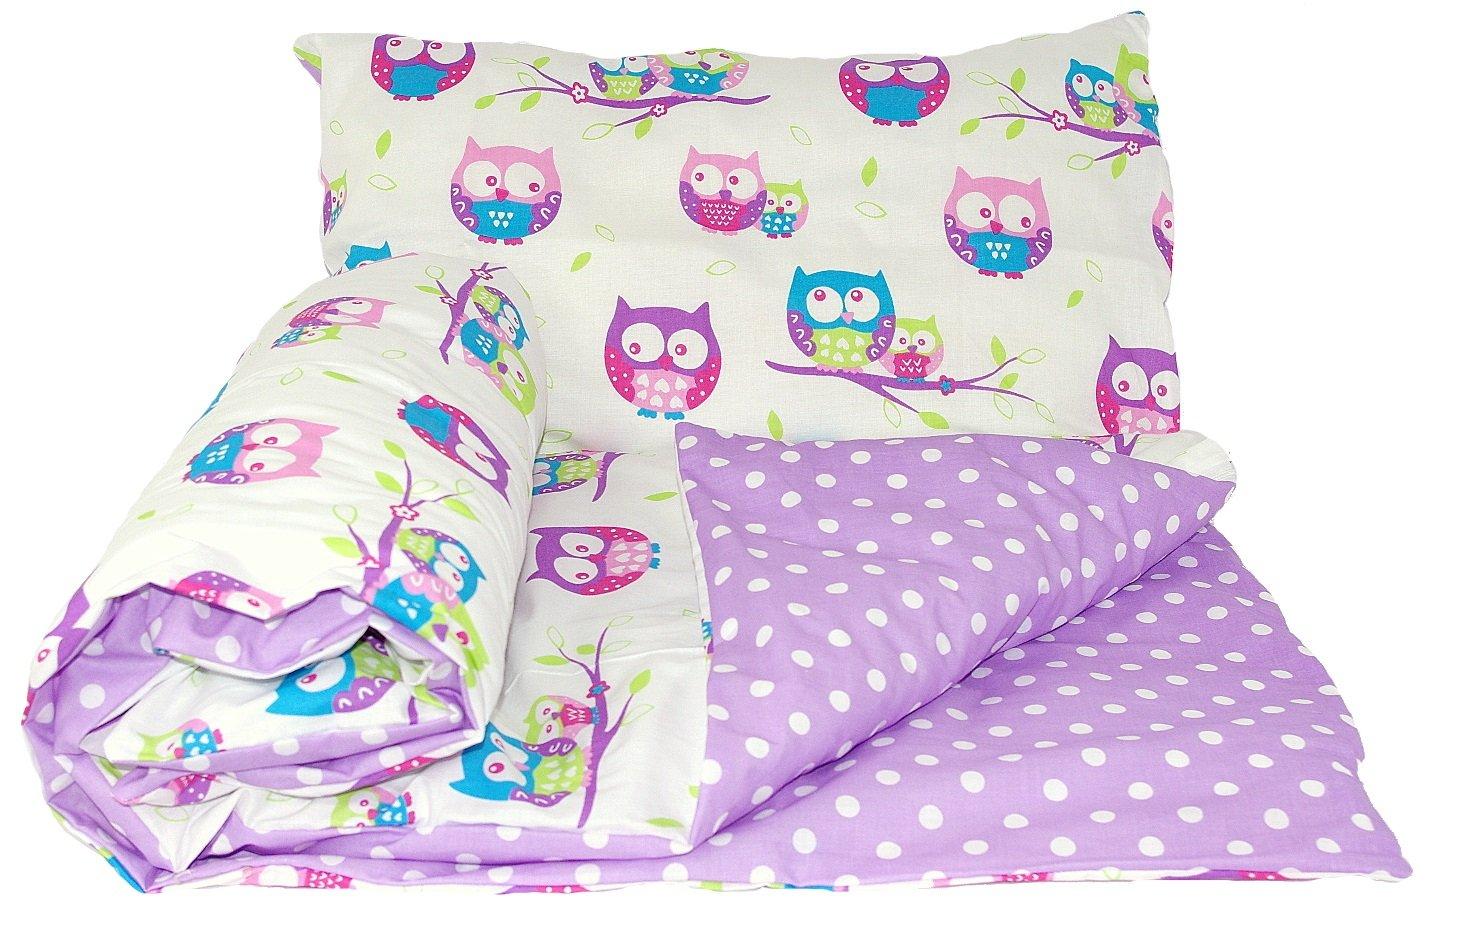 Babys Comfort REVERSIBLE 2pcs baby bedding set DUVET// QUILT COVER PILLOWCASE 150x120cm for junior beds, 21